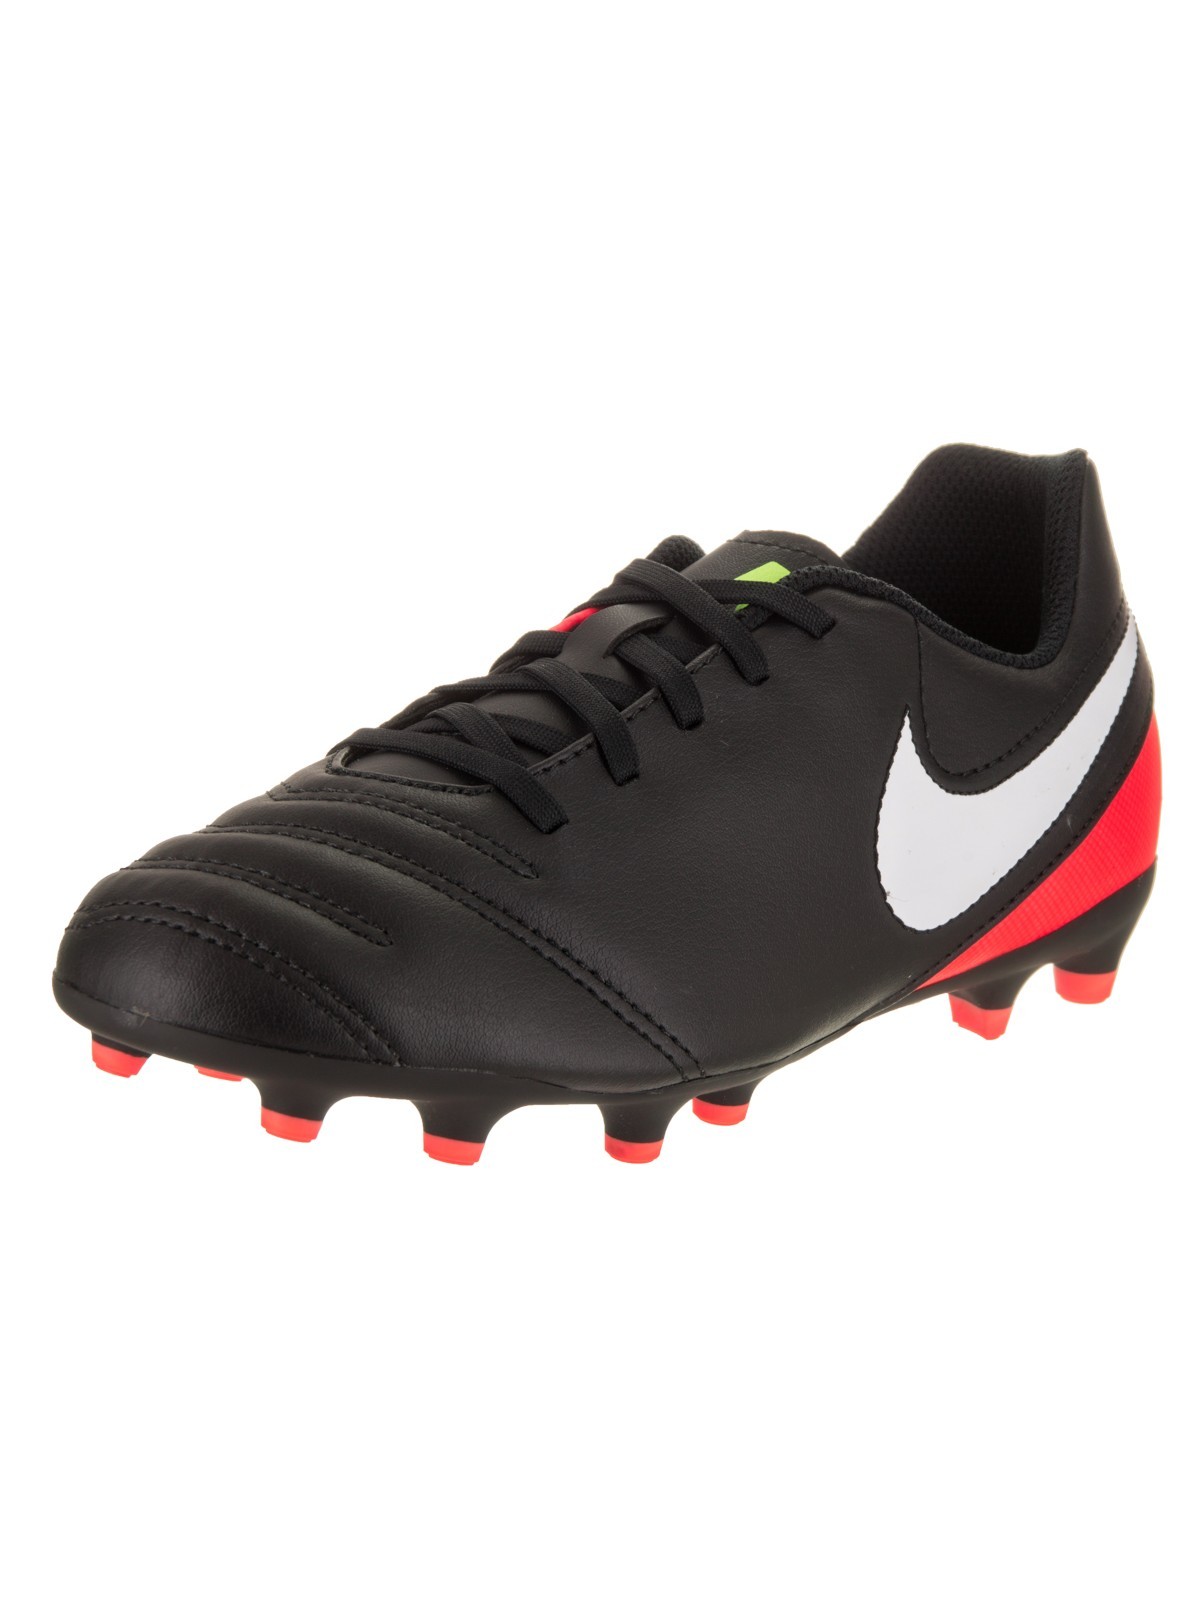 8f4adc5033af0 Nike Kids JR Tiempo Rio III Fg Soccer Cleat - Walmart.com